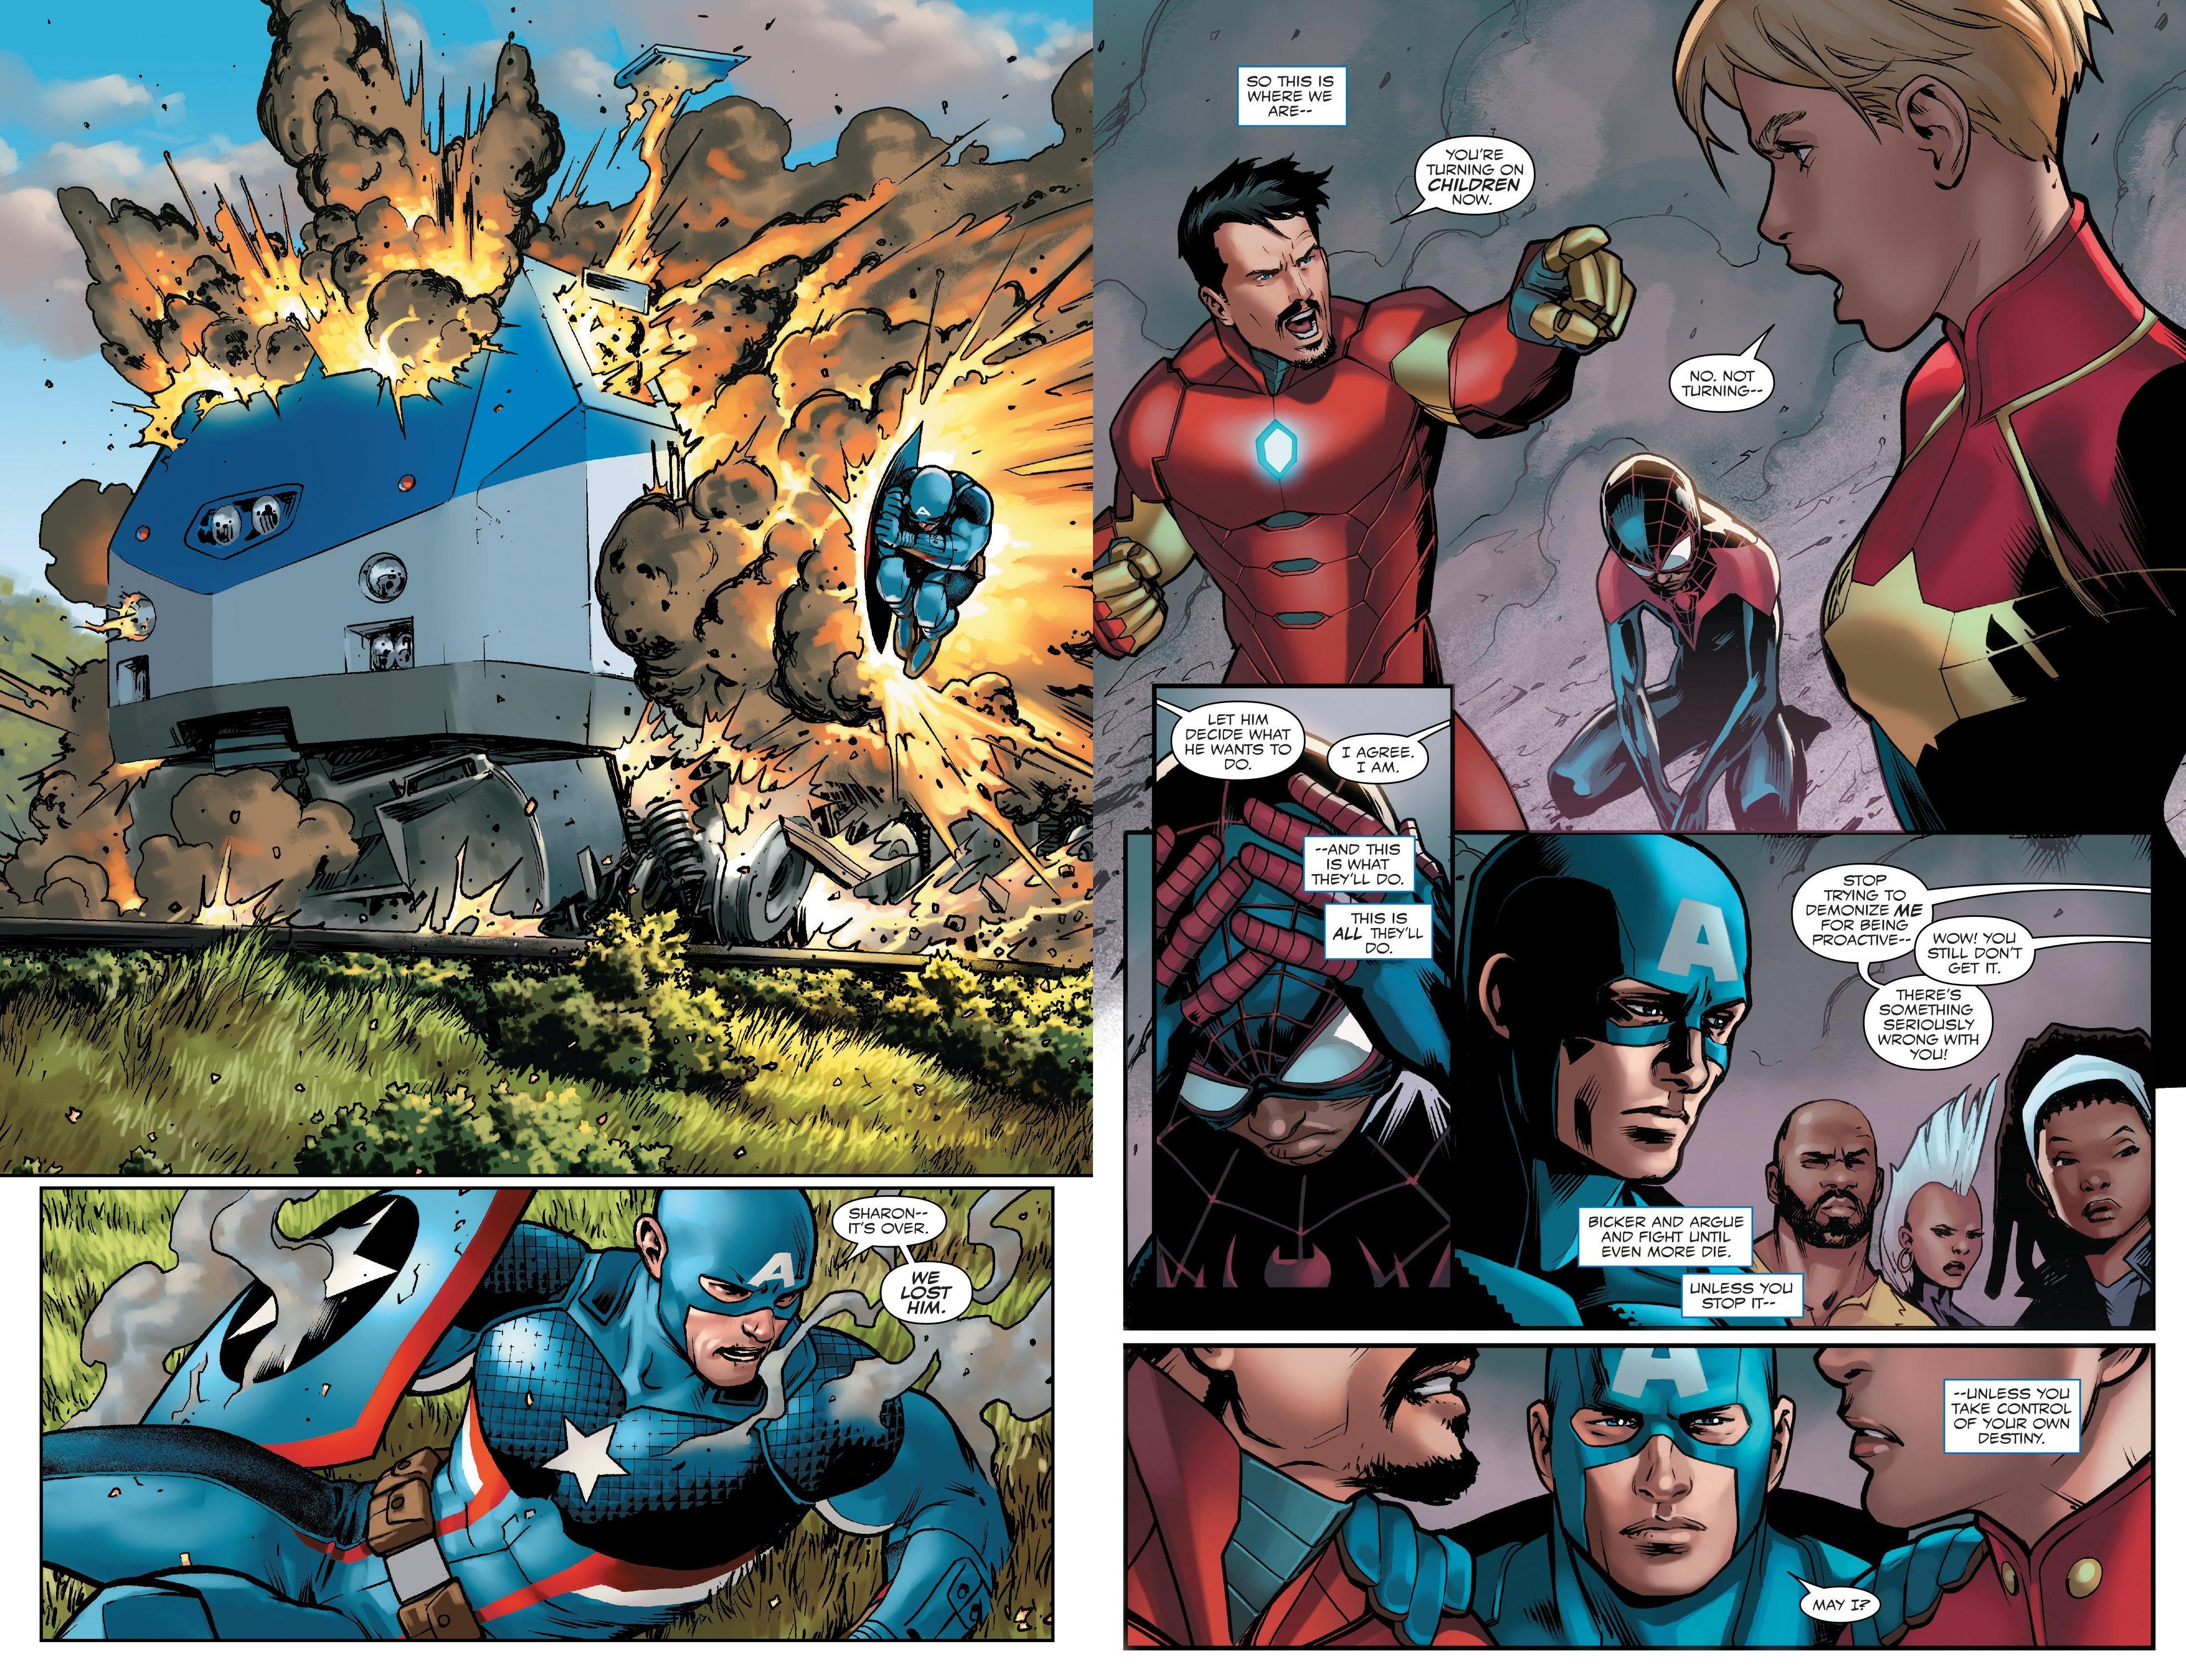 Steve Rogers Captain Am,erica Hail Hydra! review